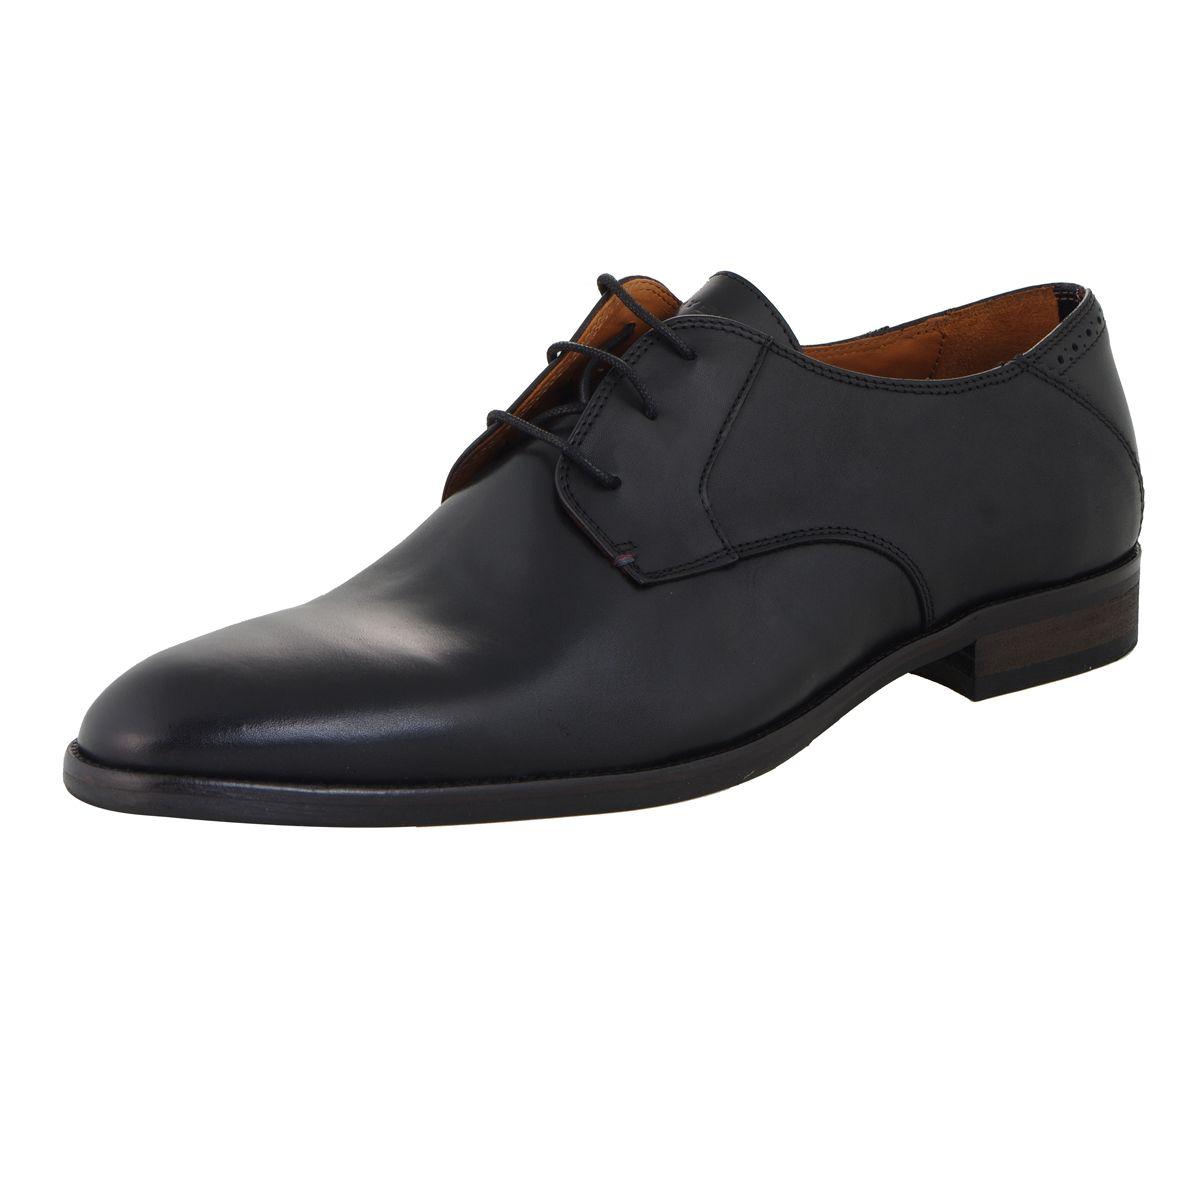 chaussures noires grande taille du 46 au 48 size factory tommy hilfiger. Black Bedroom Furniture Sets. Home Design Ideas